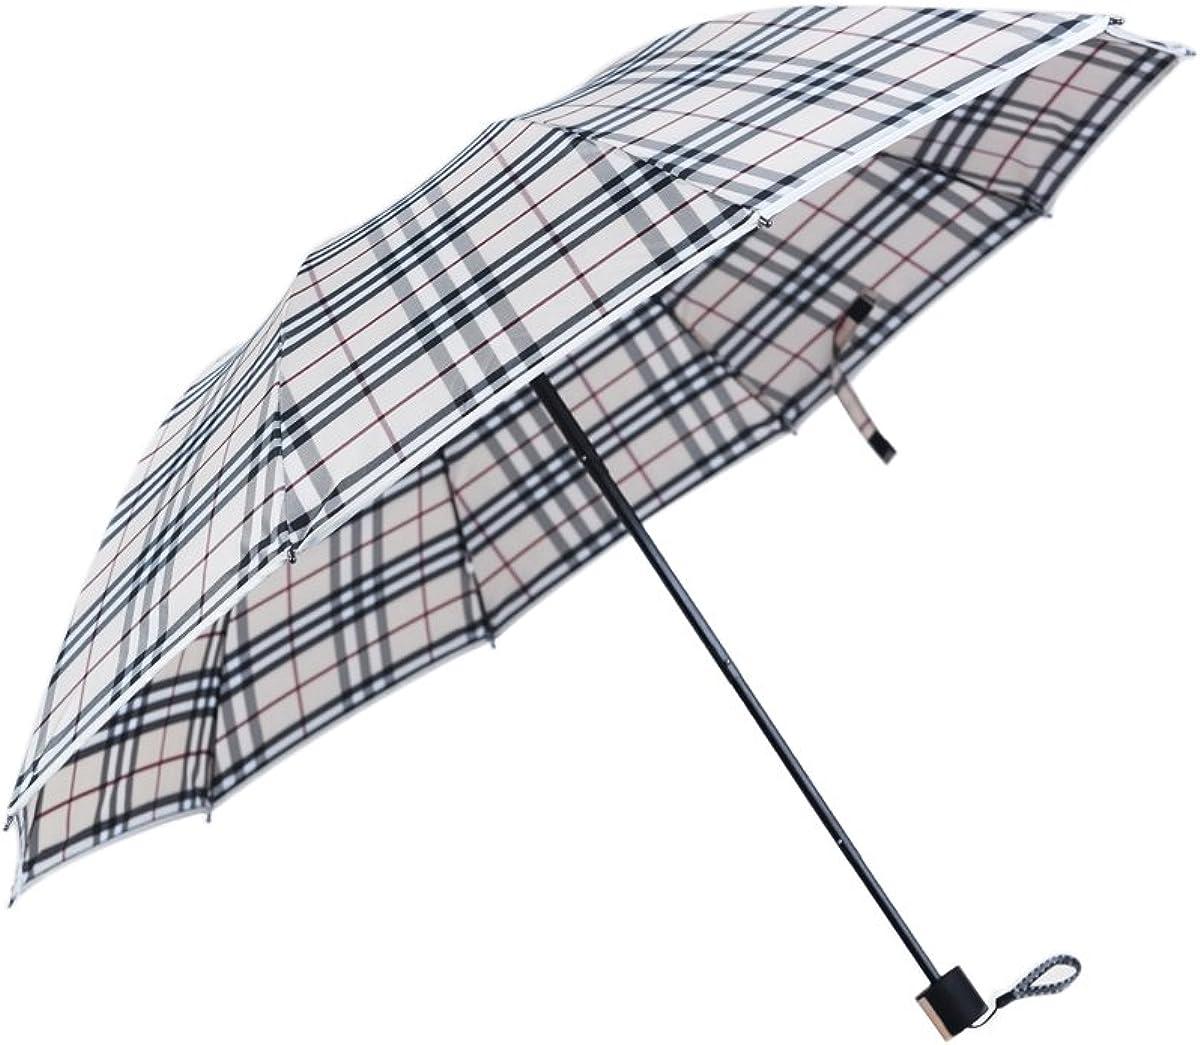 Waterproof and Windproof Multi-Purpose 3 Folding Umbrella Double layer UV Protection